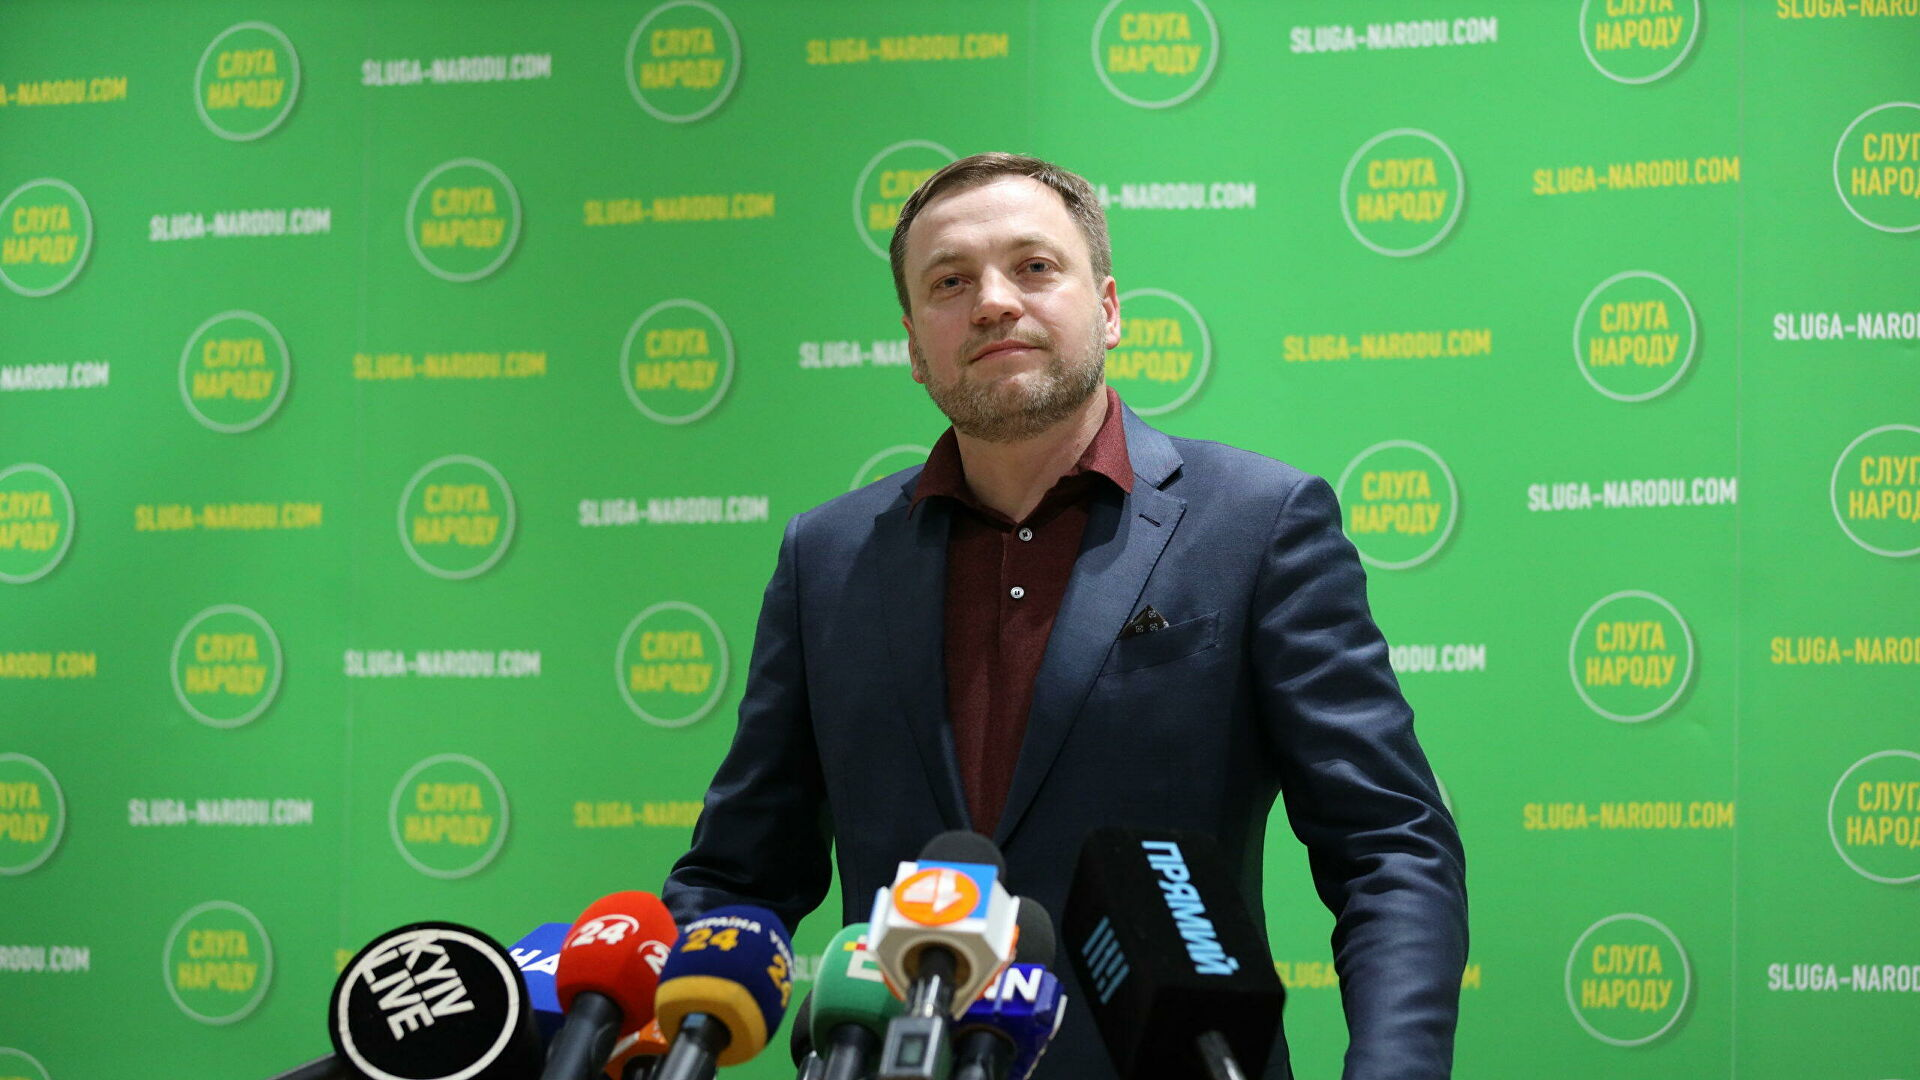 Зеленский предложил Монастырского на место Авакова